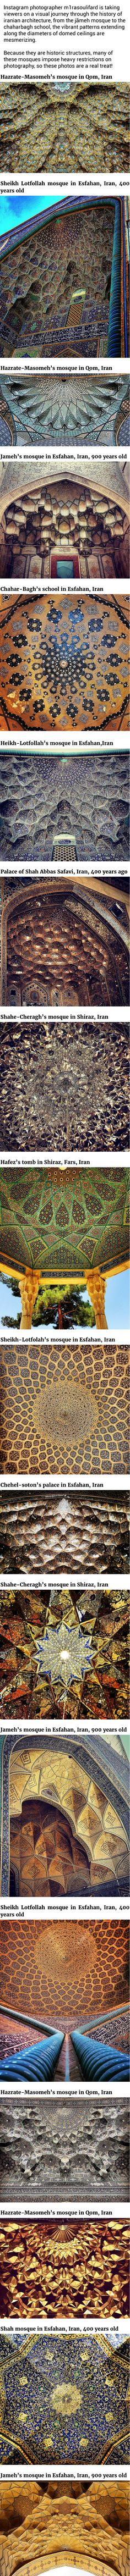 Photographer Captures The Mermerizing Beauty Of Iranian Mosque Cerlings - 9GAG